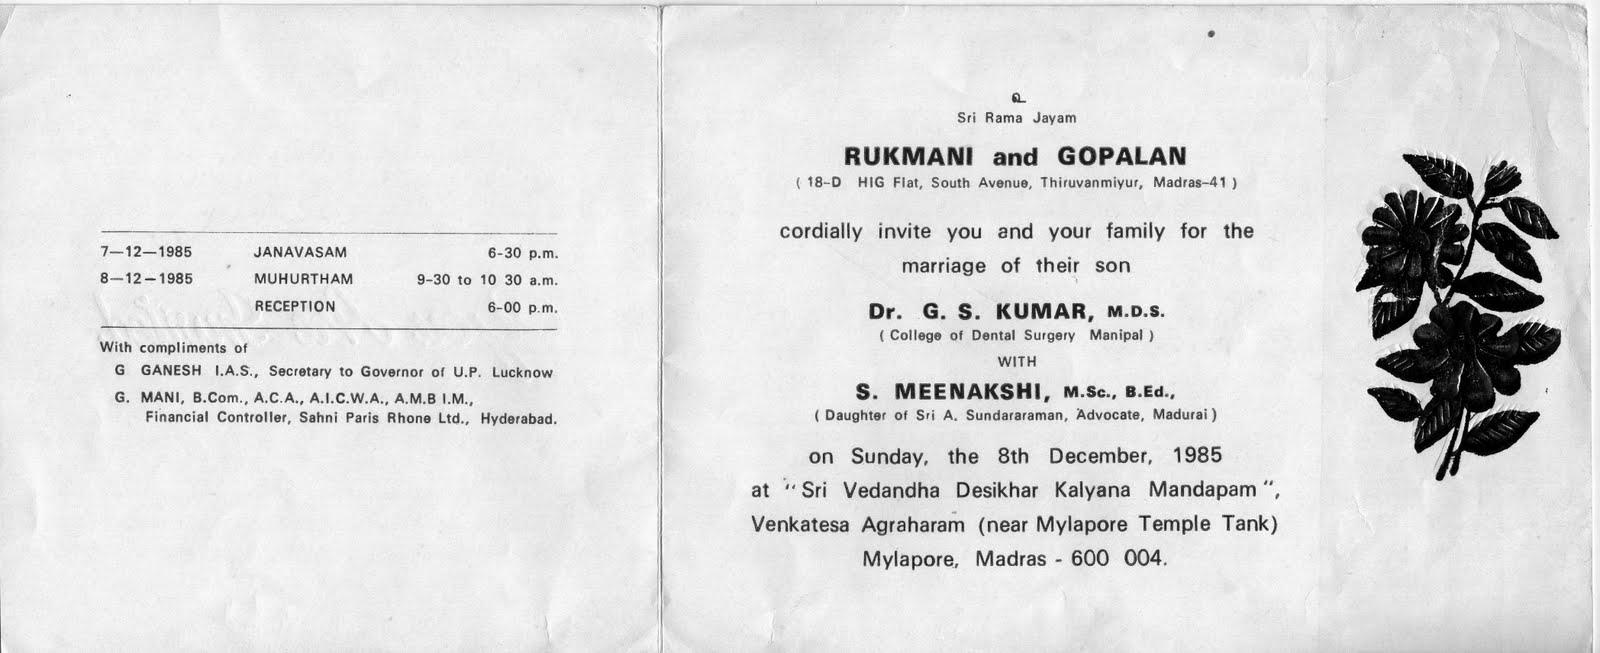 wedding invitation wording in tamil nadu - 28 images - marriage ...